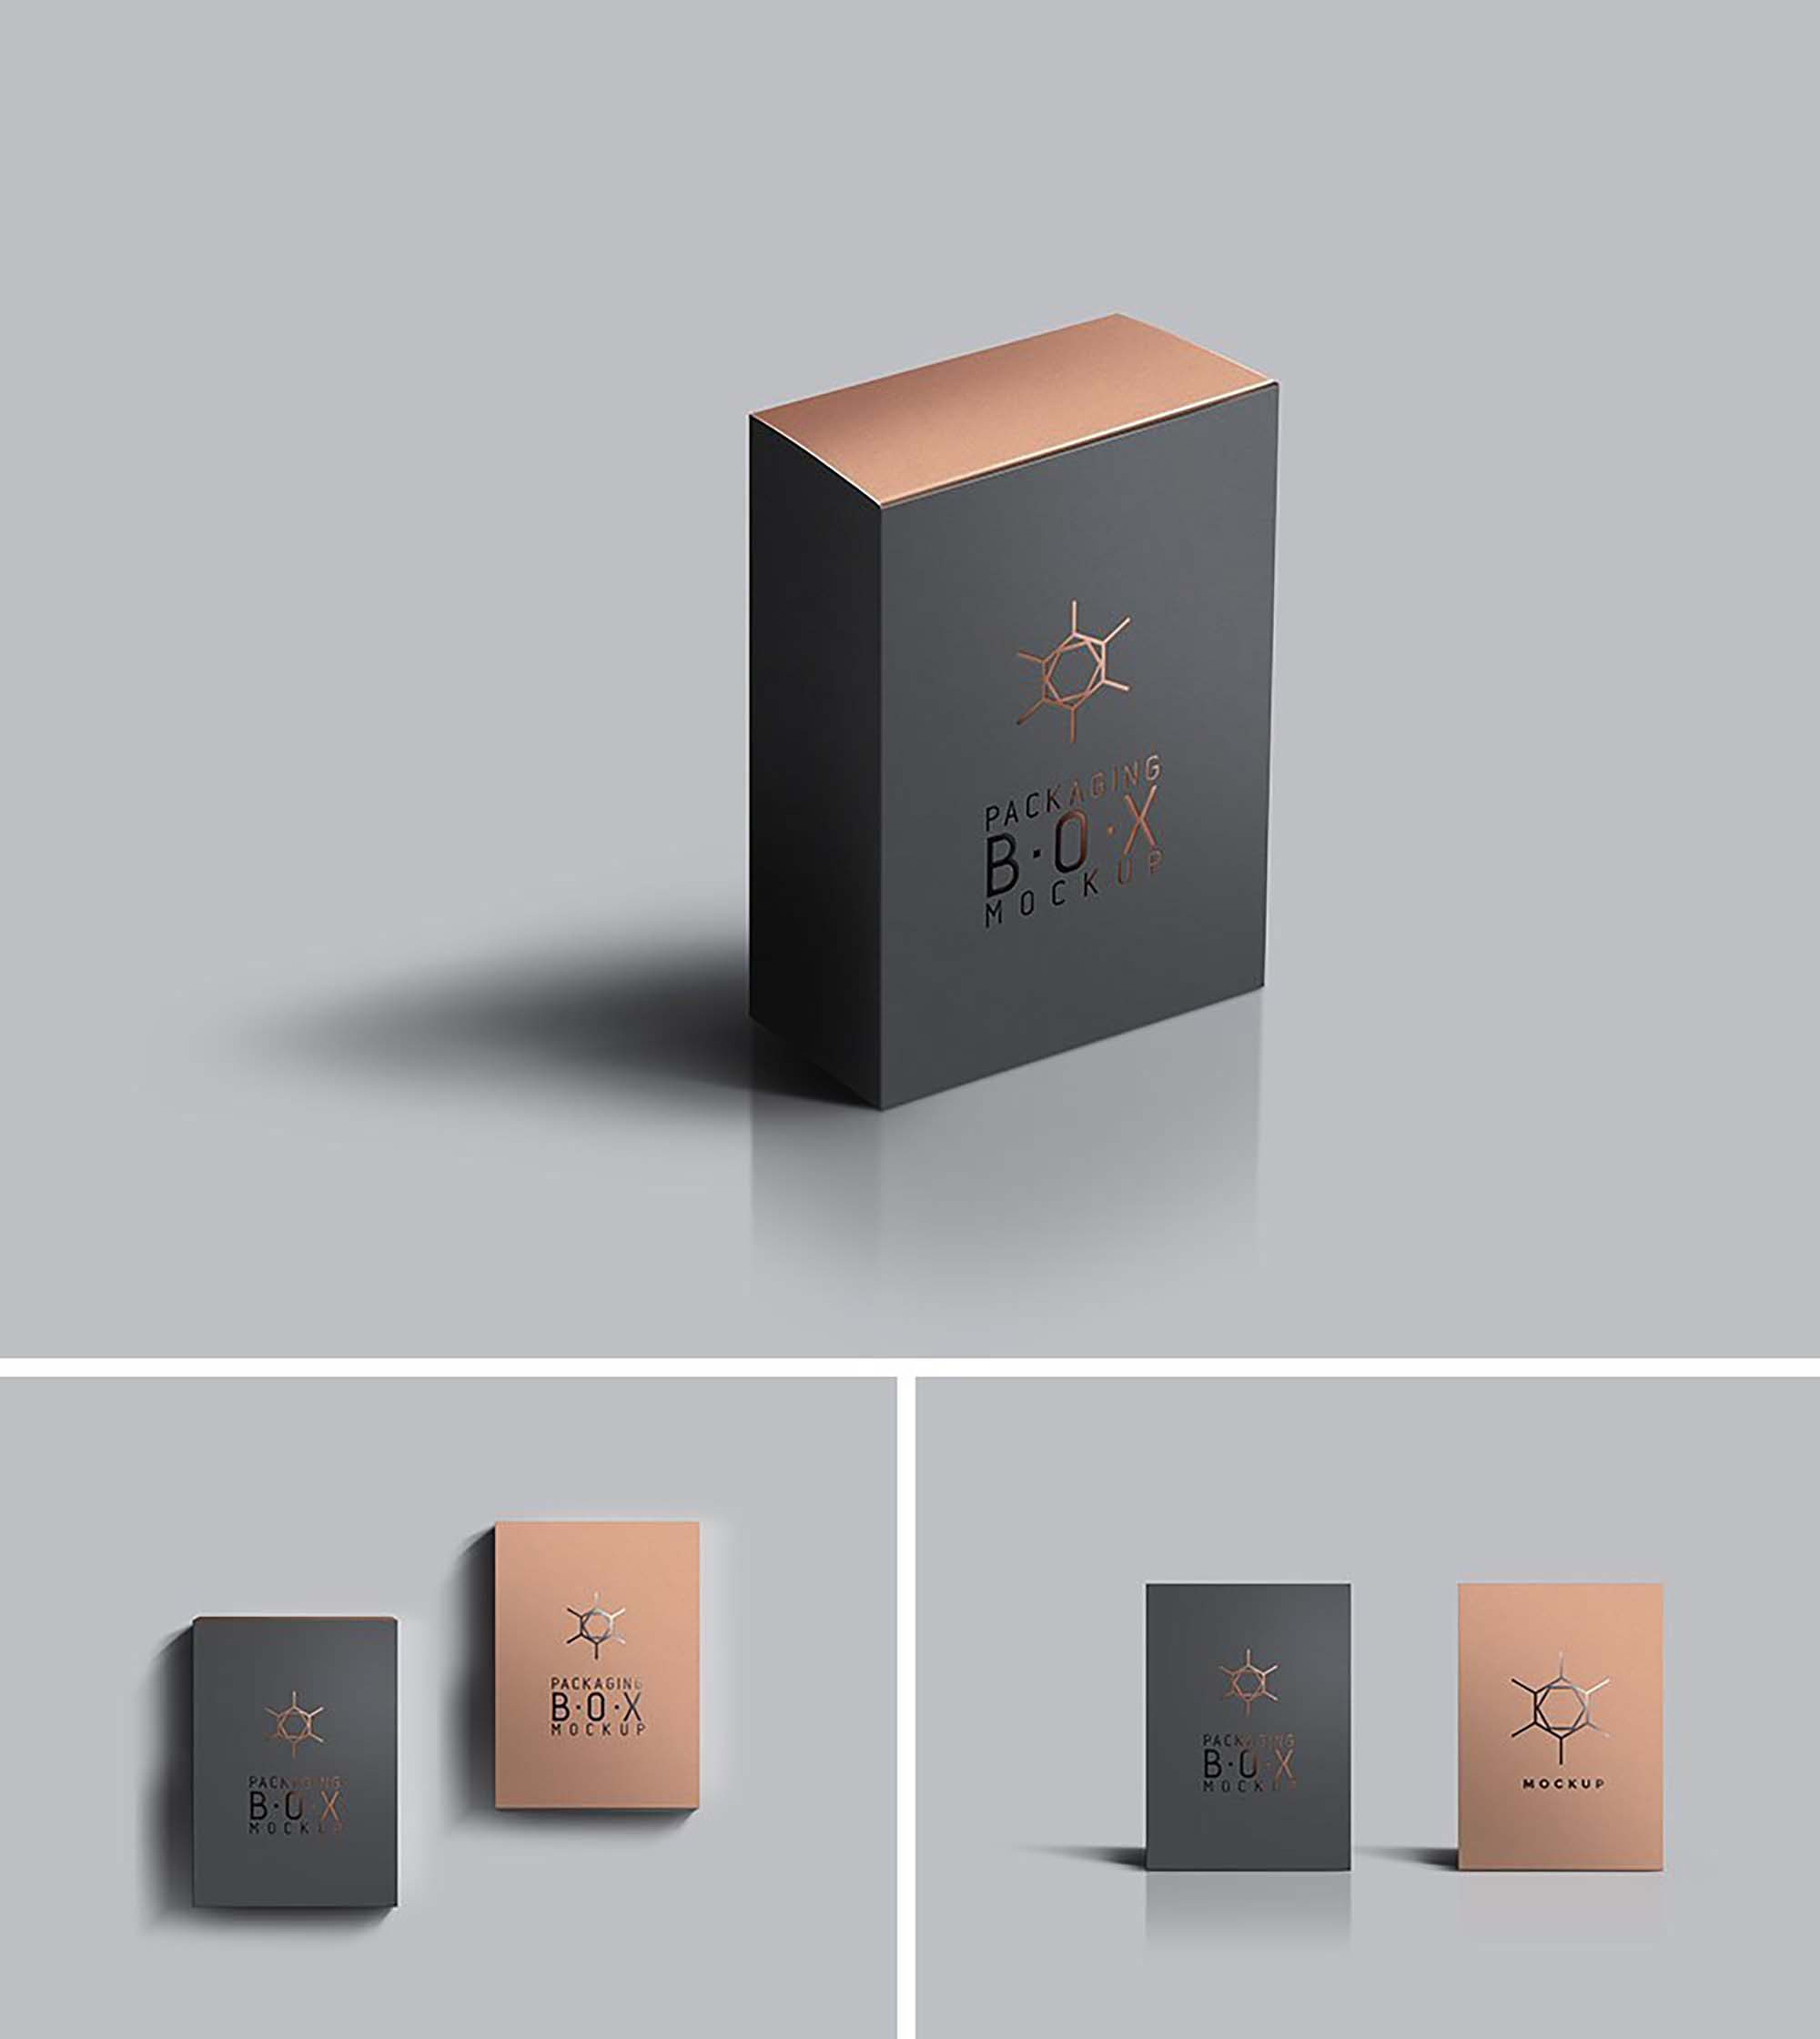 Packaging Product Box Mockup 4